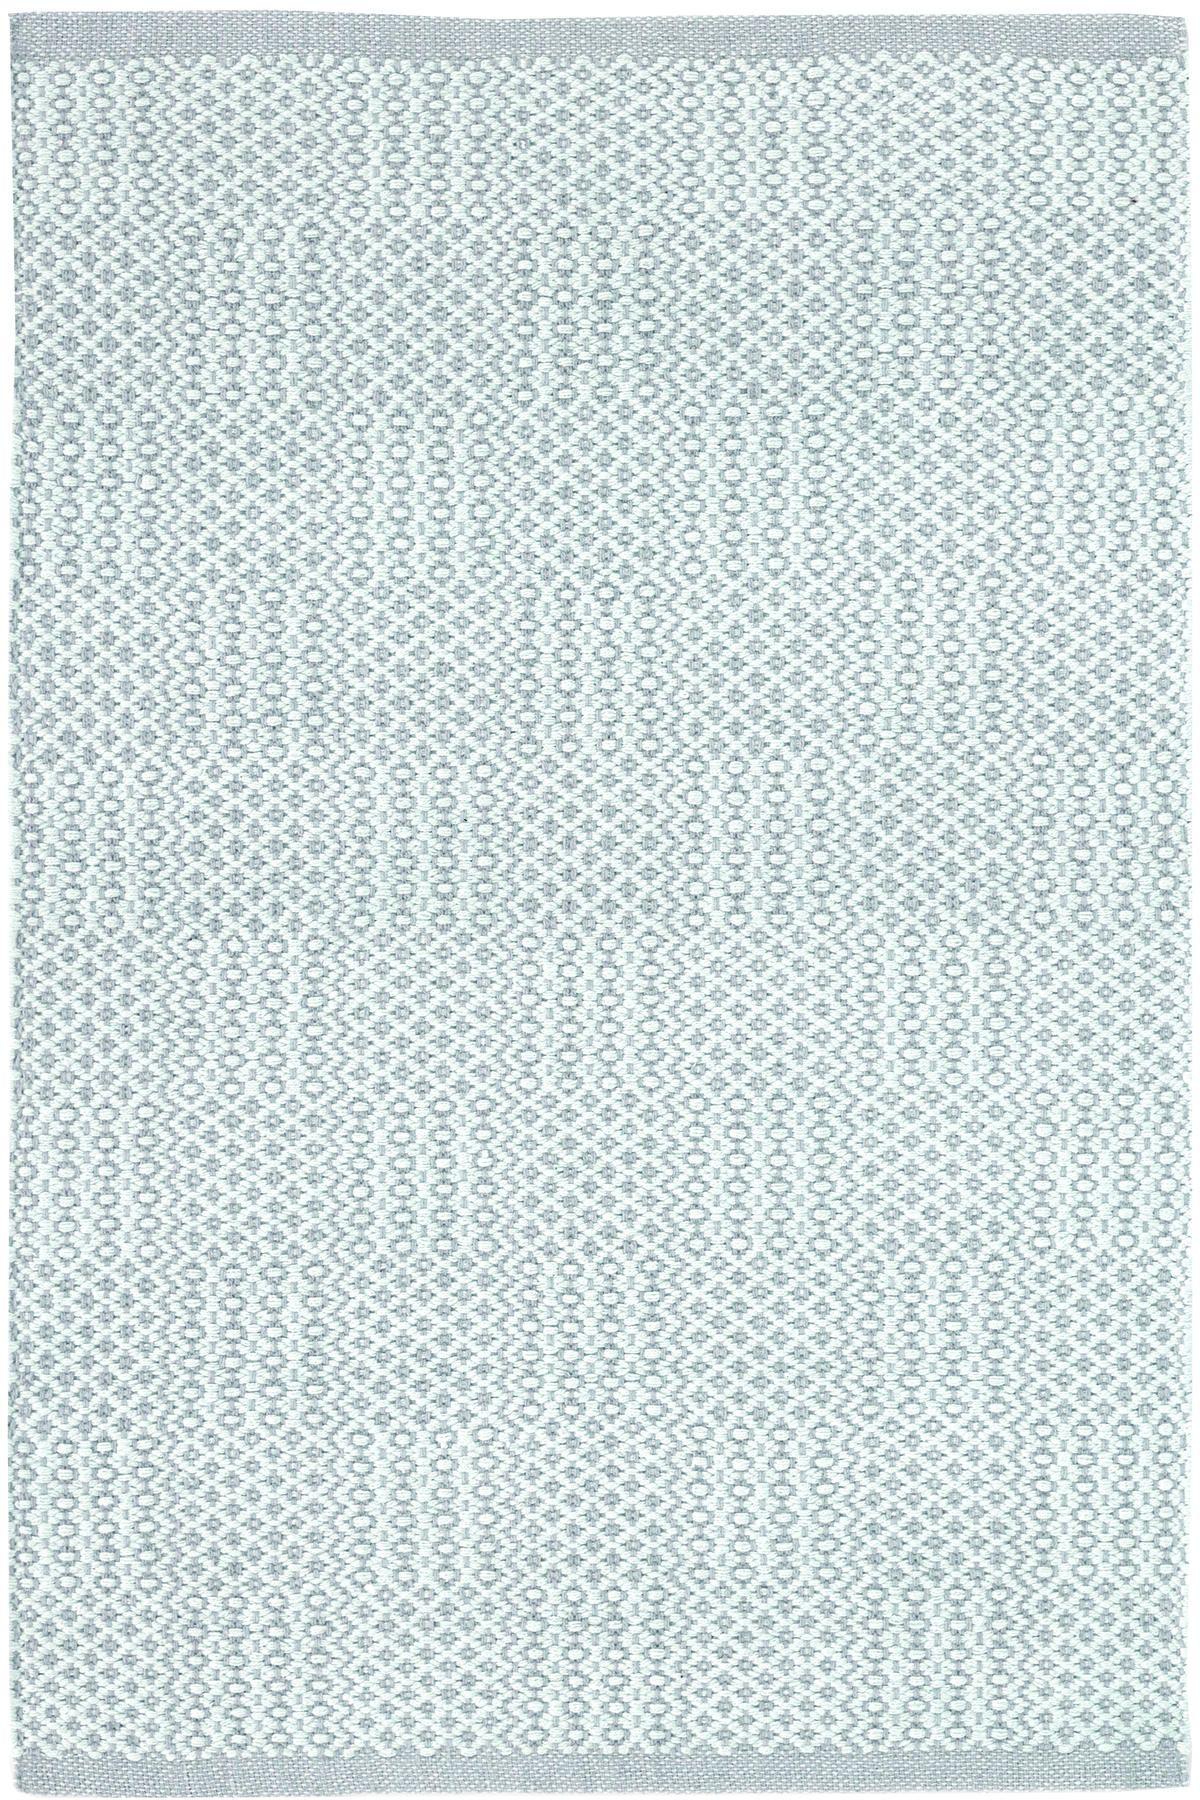 Dash Albert Bonnie Blue Woven Cotton Rug Interior Decorating